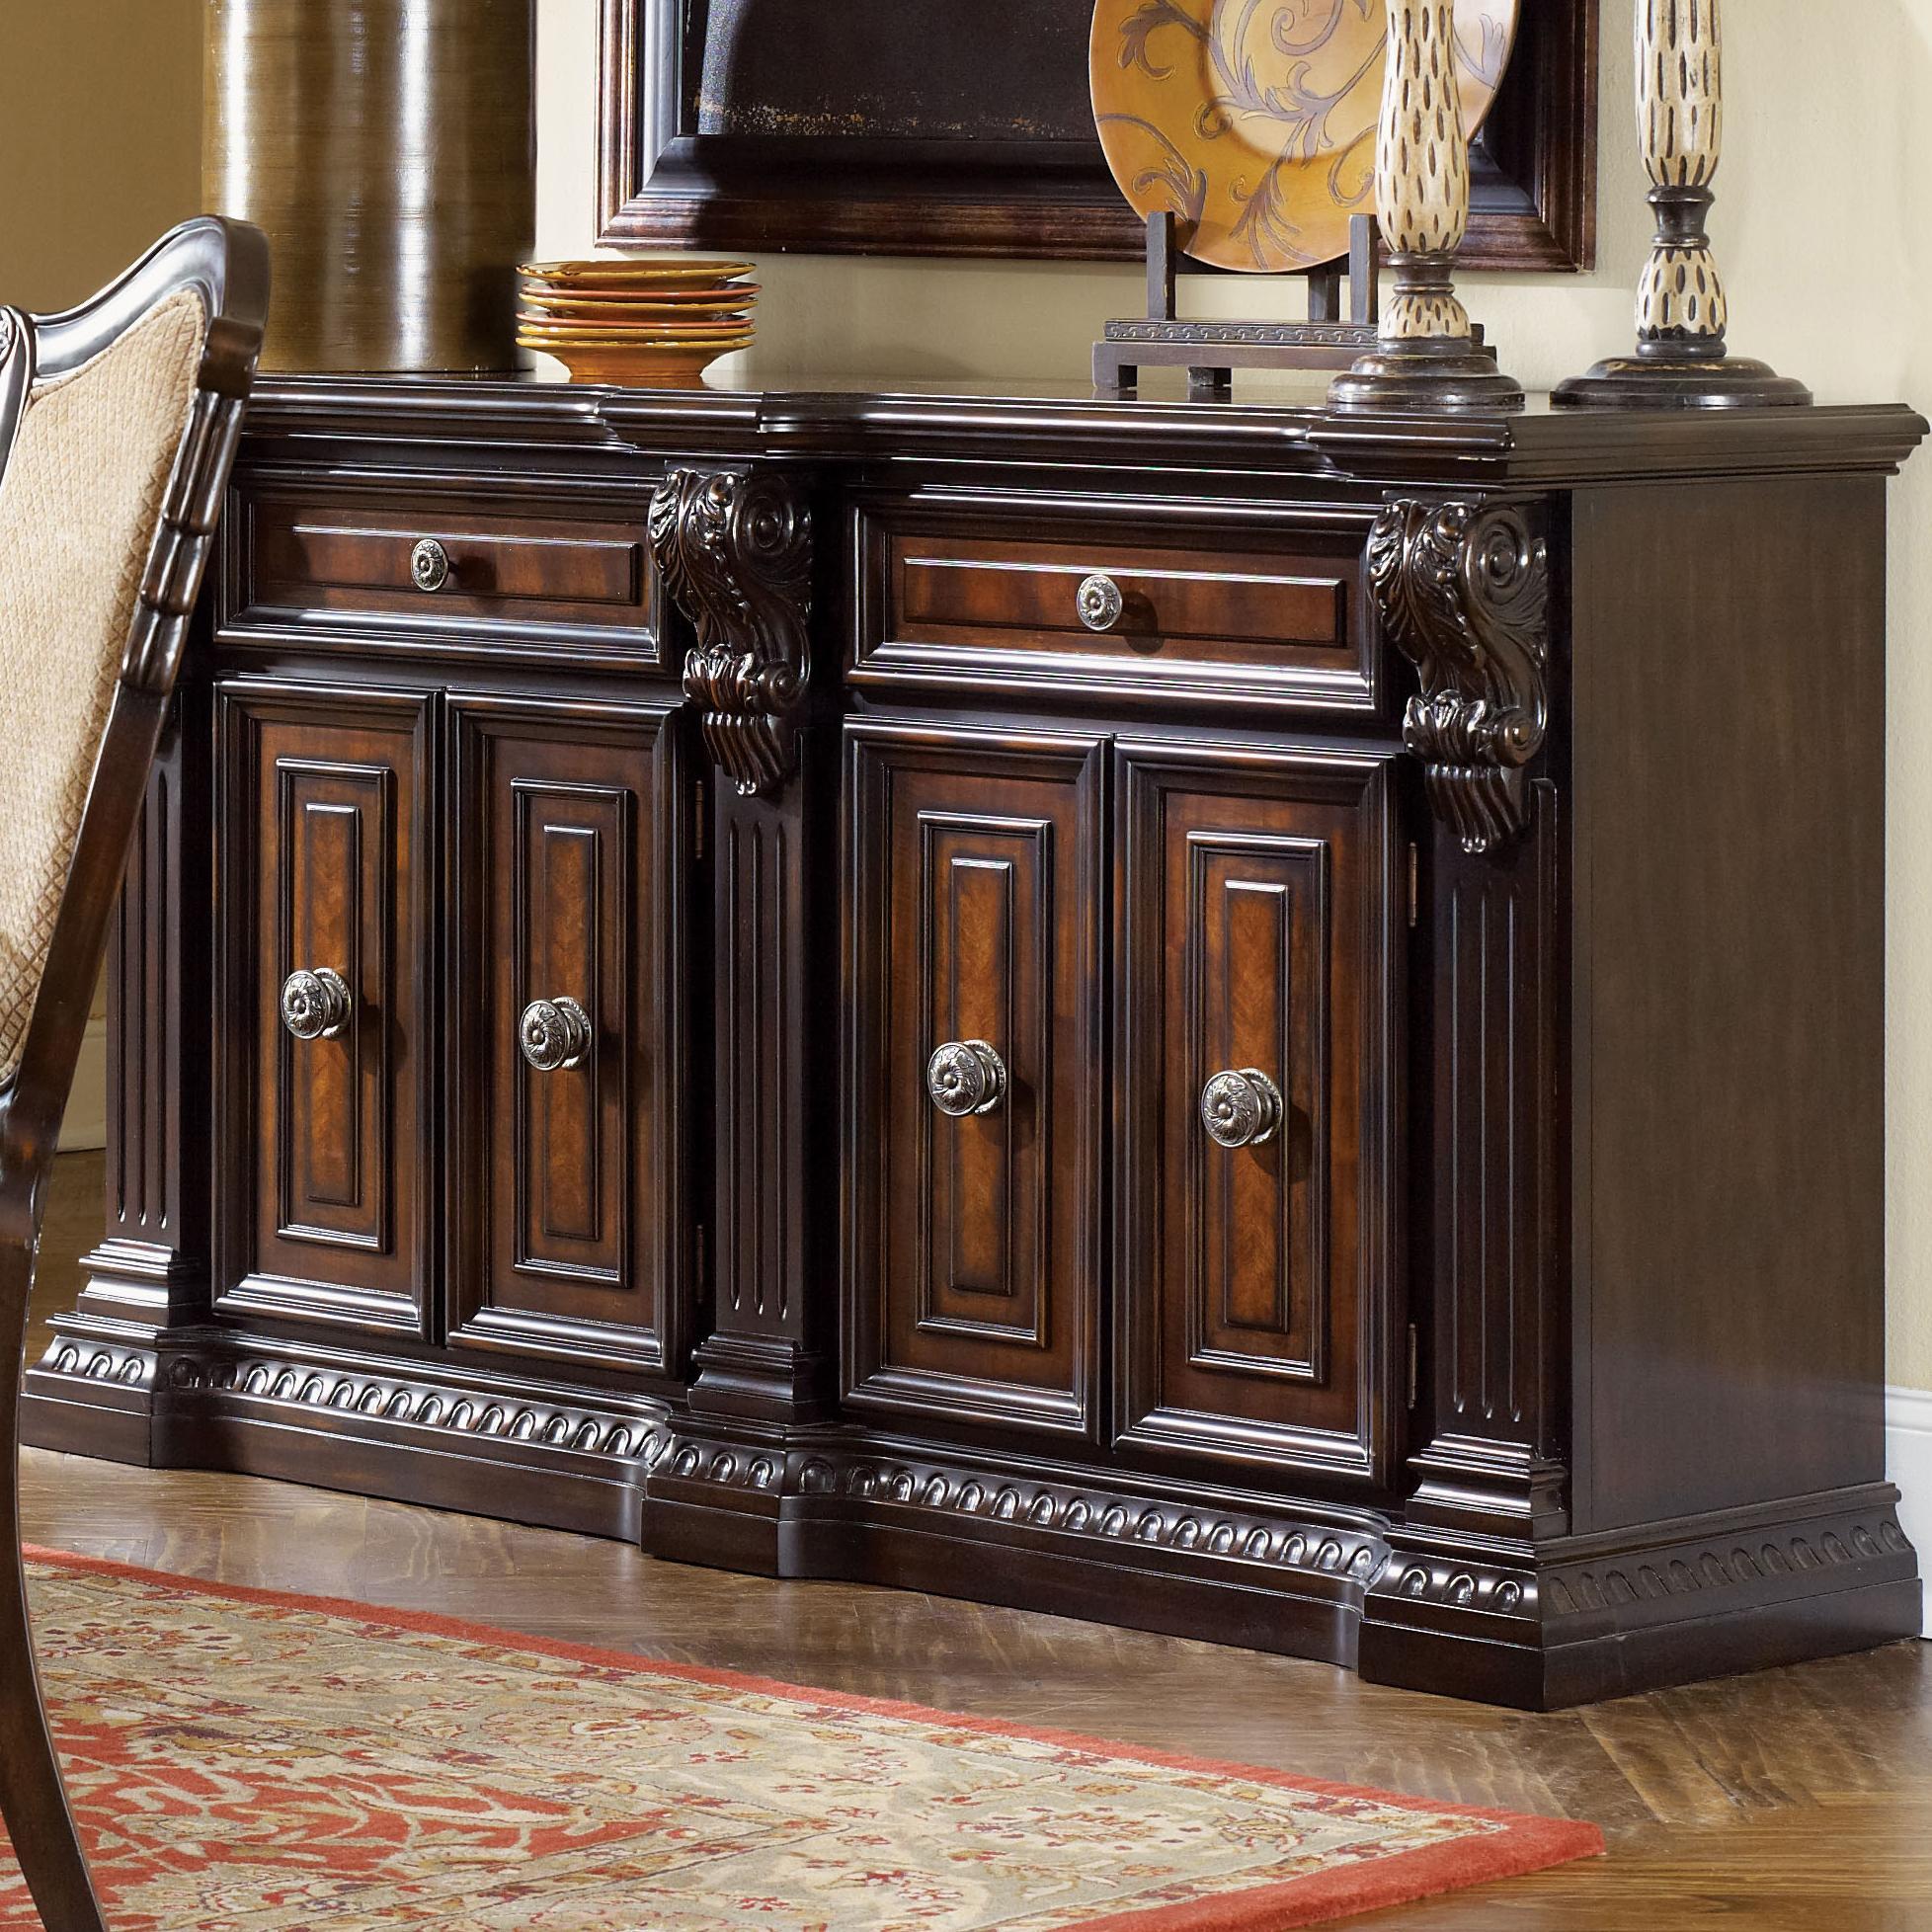 fairmont designs grand estates sideboard table w 2 drawers dream home furniture sideboards. Black Bedroom Furniture Sets. Home Design Ideas